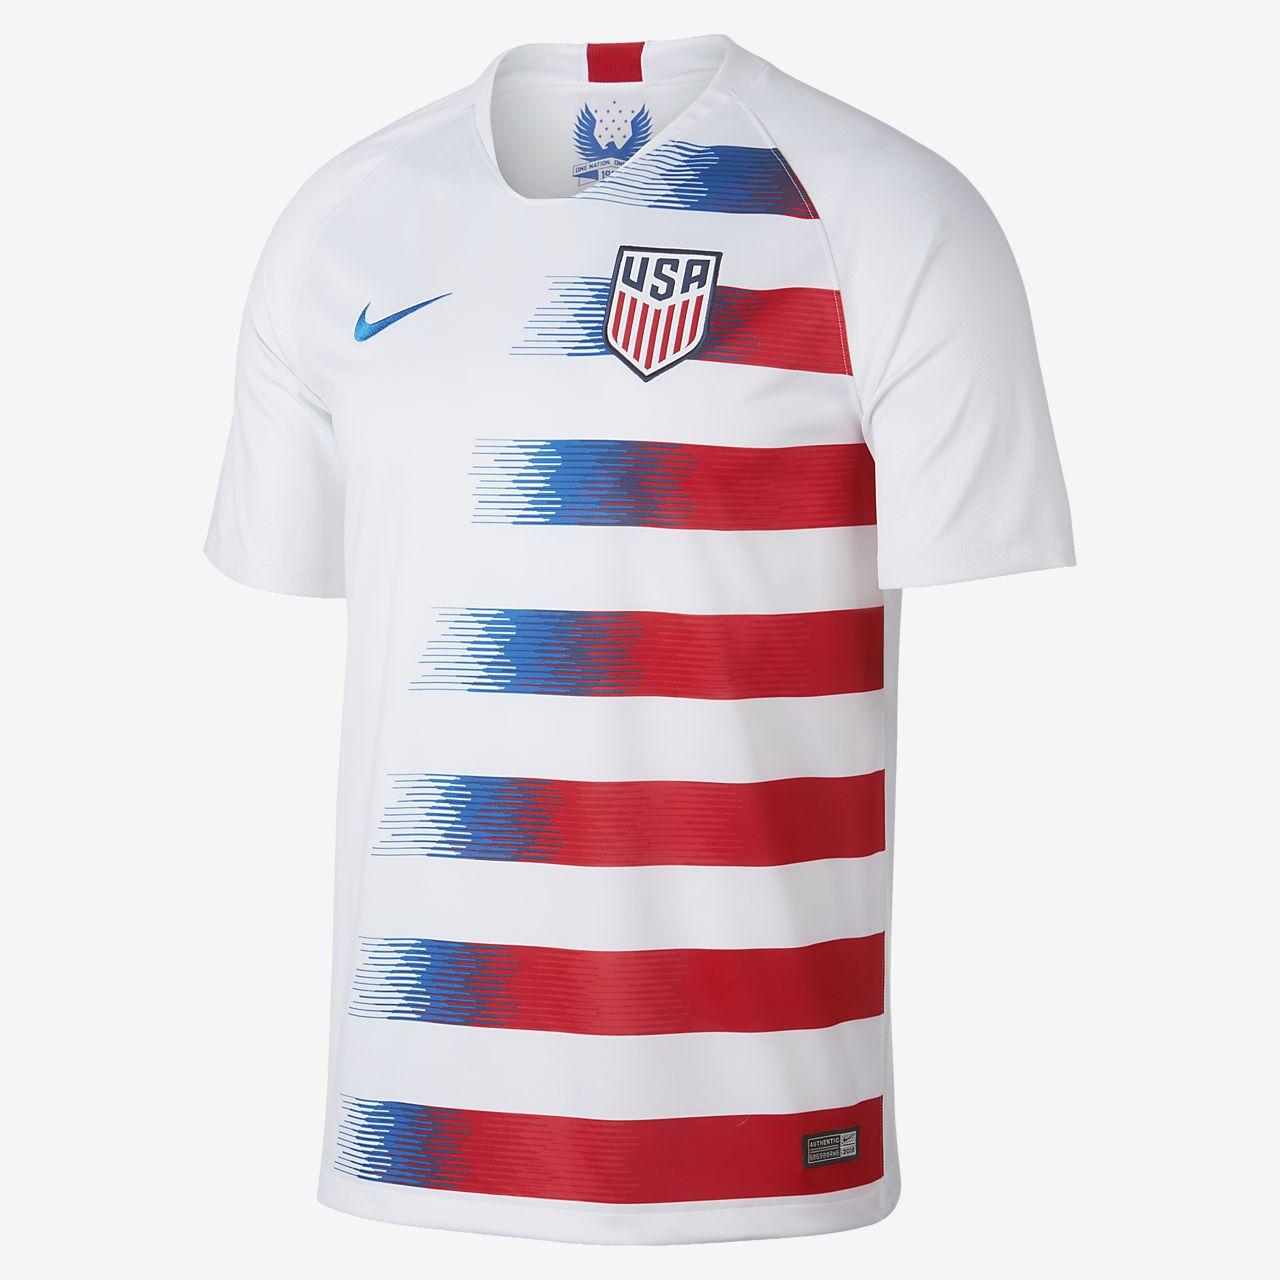 Nike USA Breathe Stadium Jersey - Men's Soccer - White/Speed Red/Blue Nebula